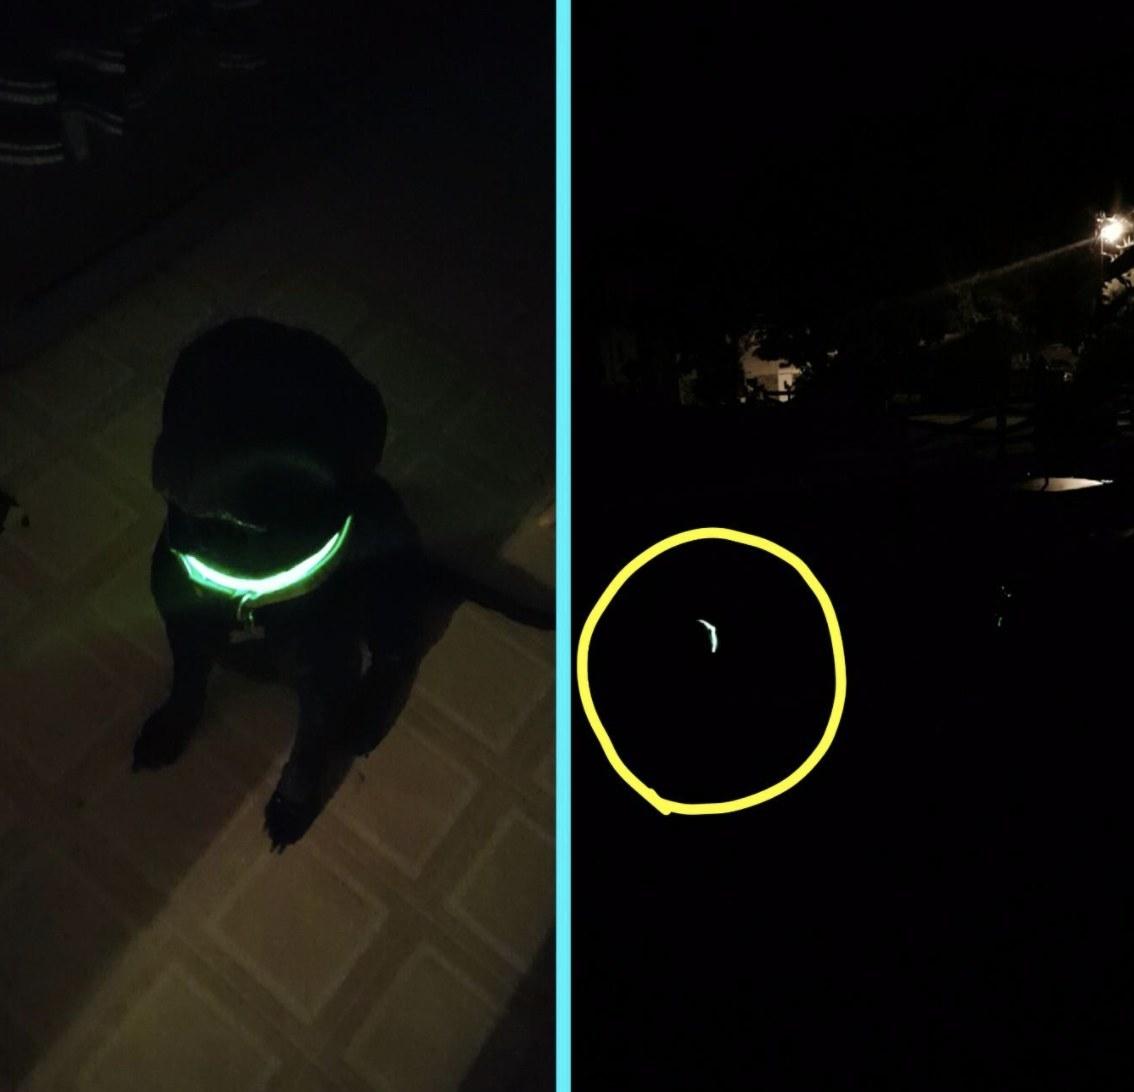 A dog wearing an LED collar in the dark